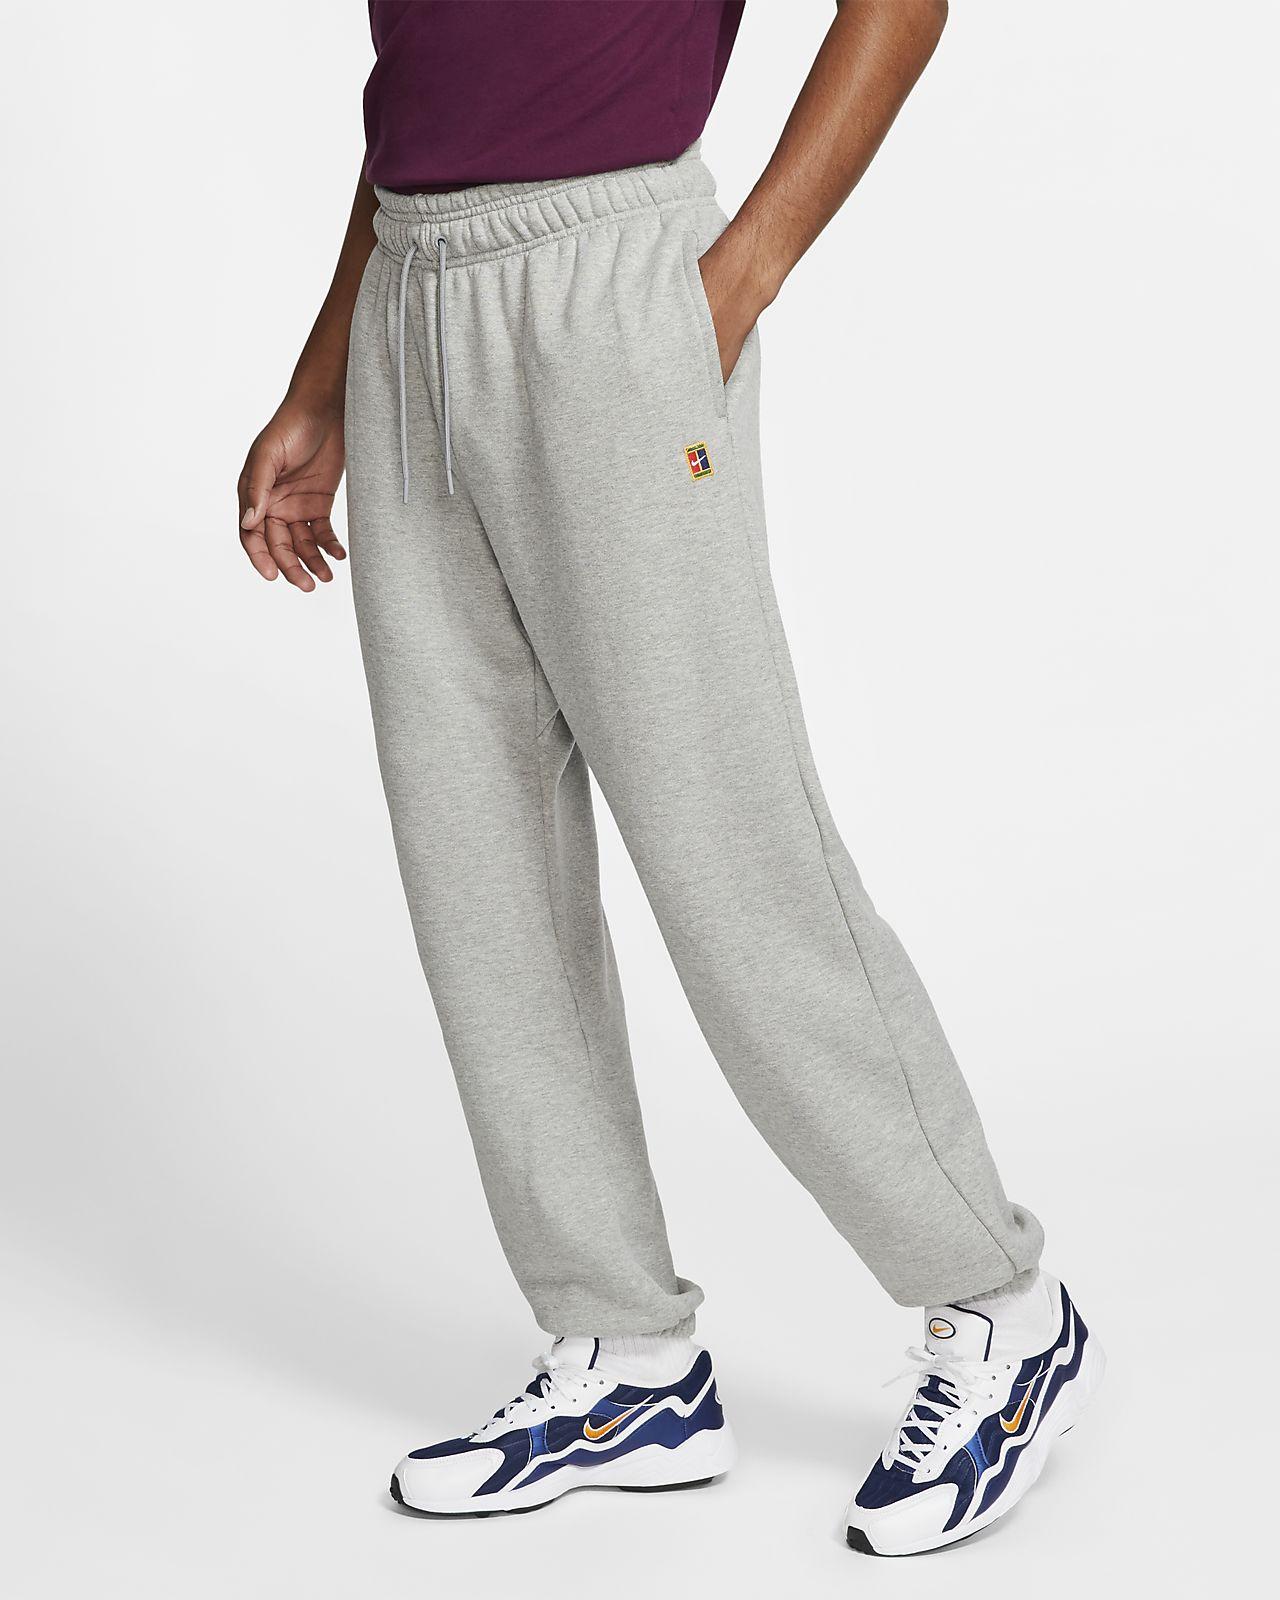 NikeCourt Men's Fleece Tennis Trousers